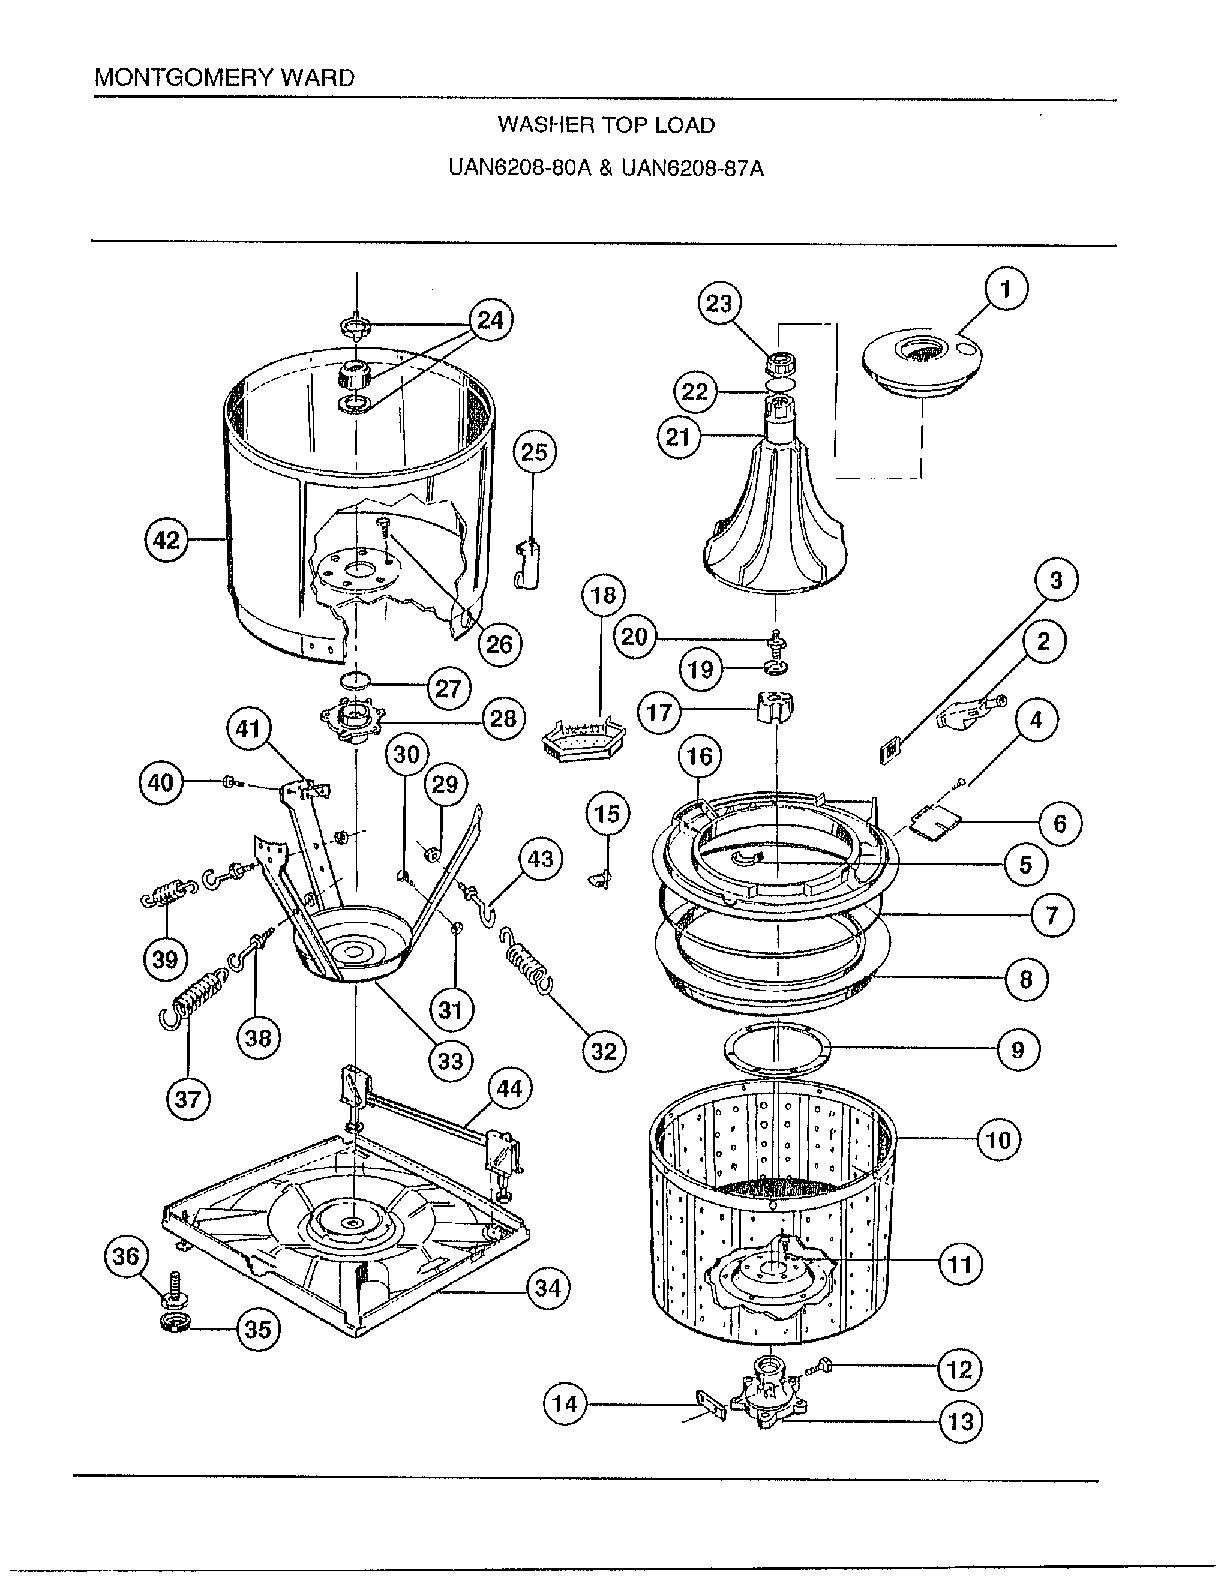 Wiring Diagram: 32 Frigidaire Washing Machine Parts Diagram